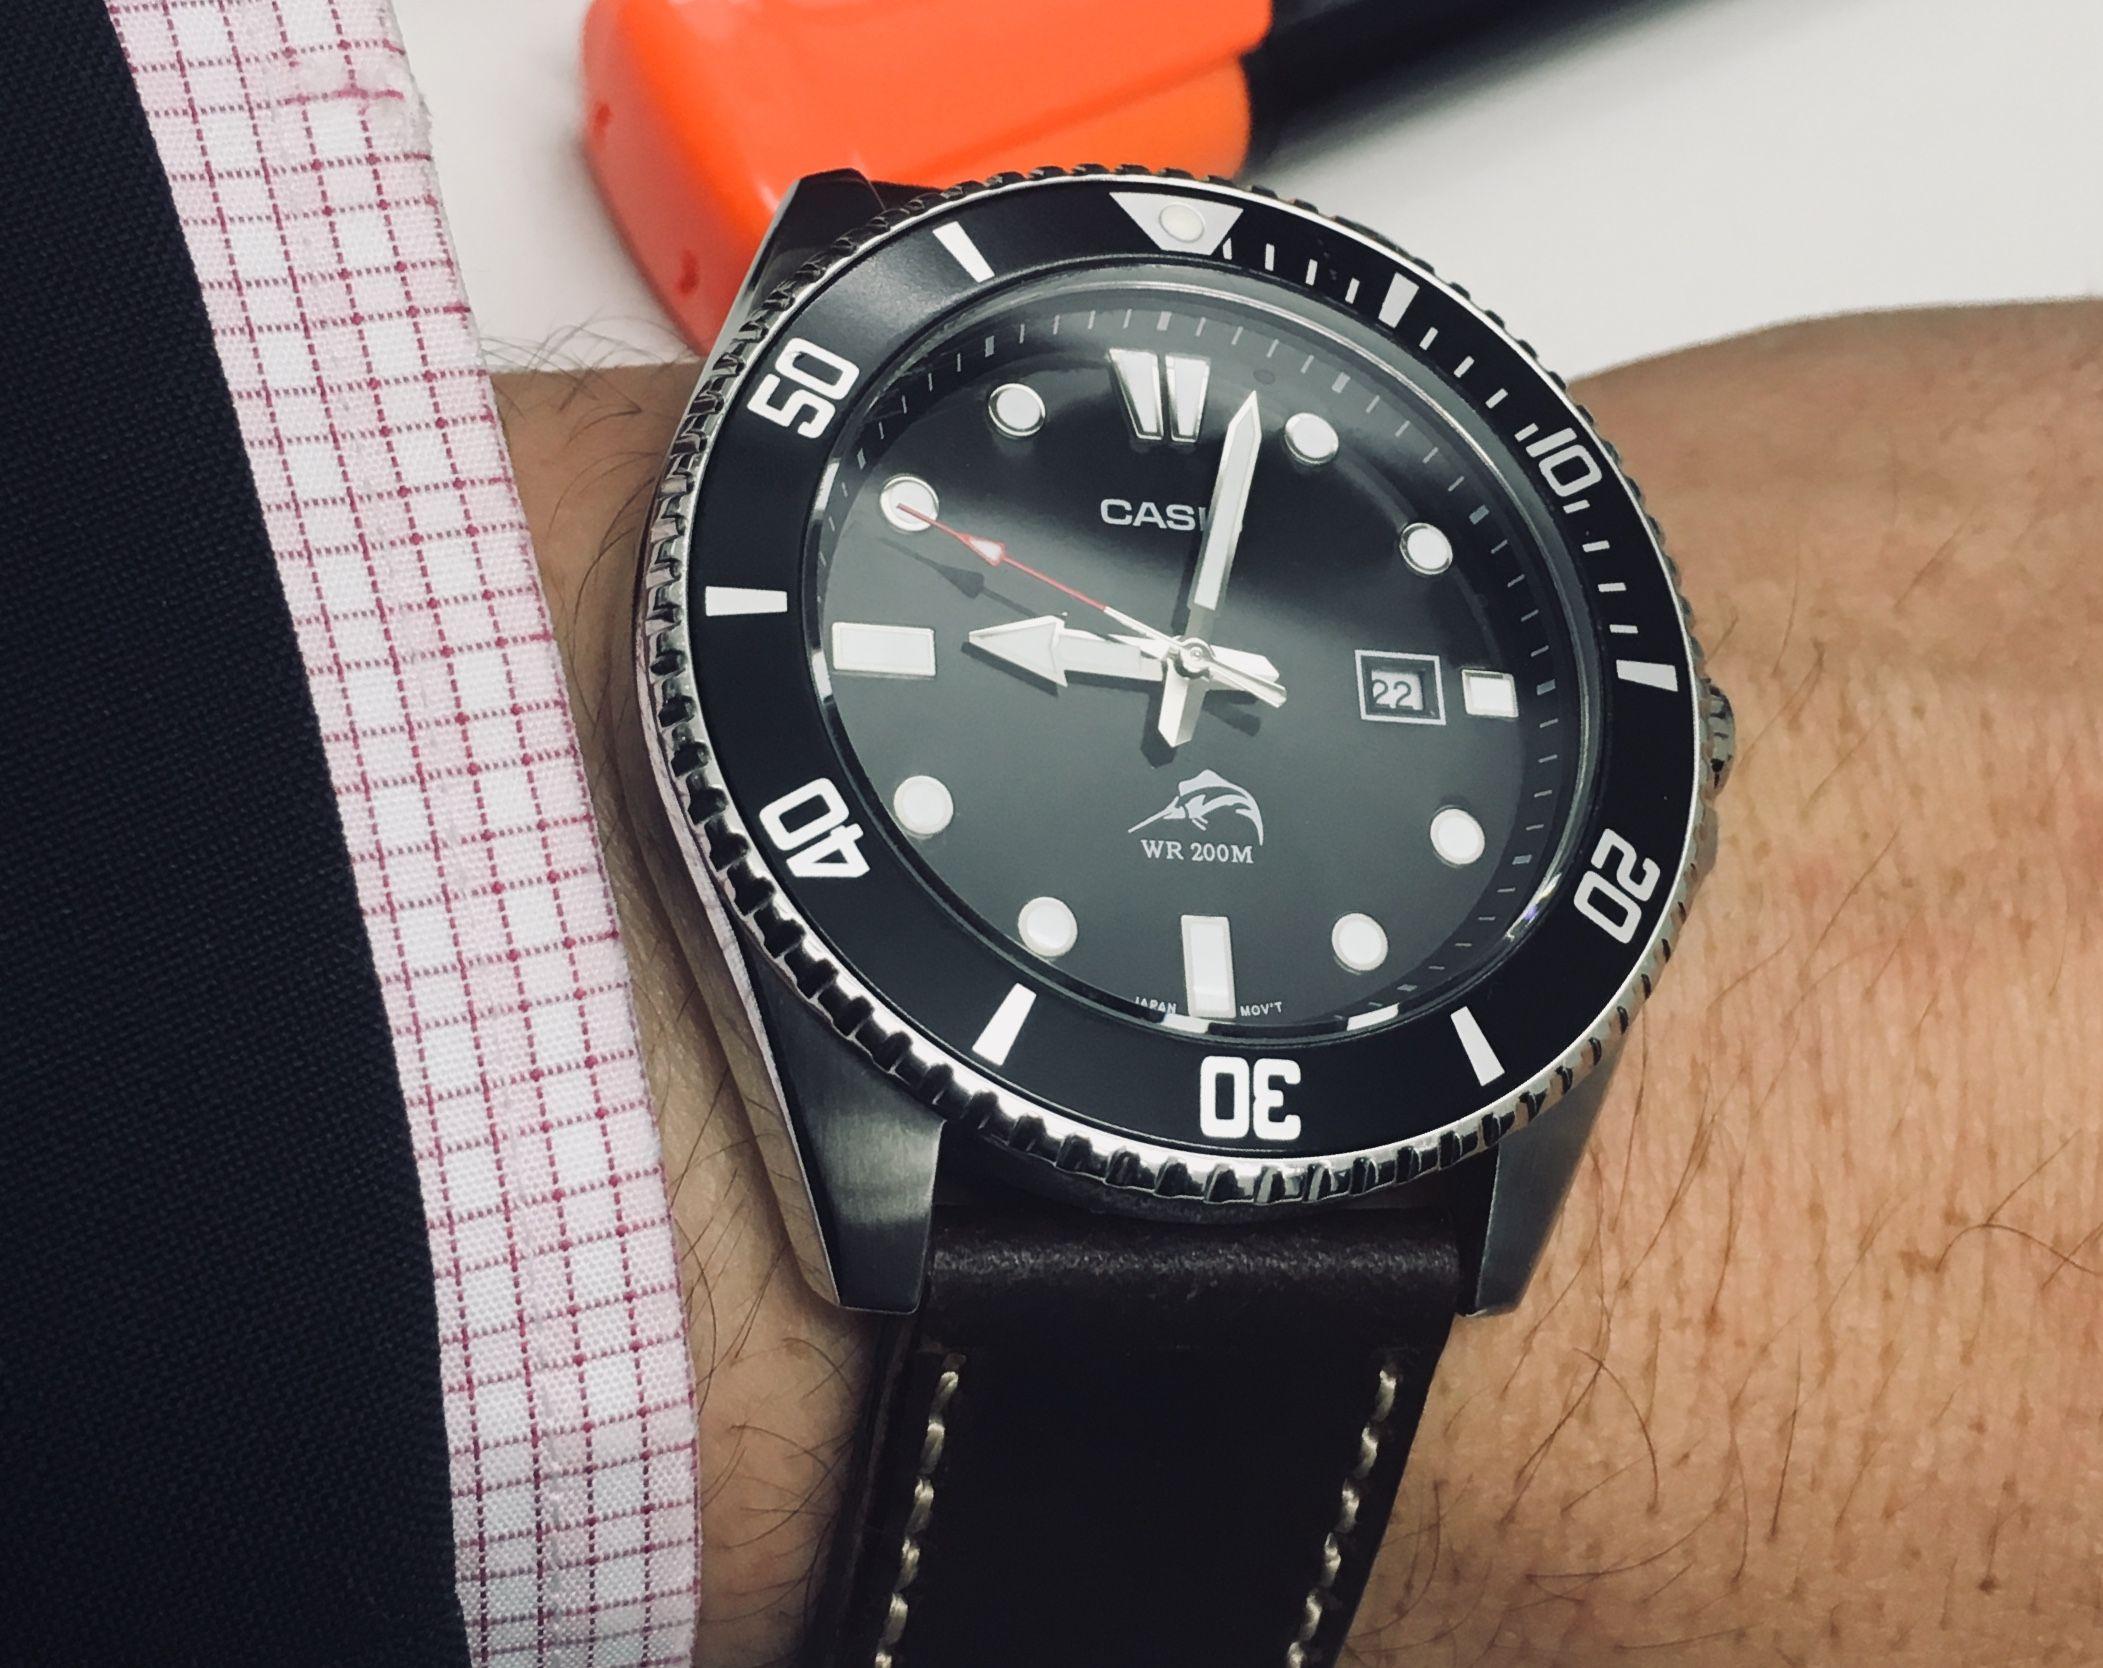 1aRelojes Mdv106 200m Casio Divers Reloj PuZiOkTX